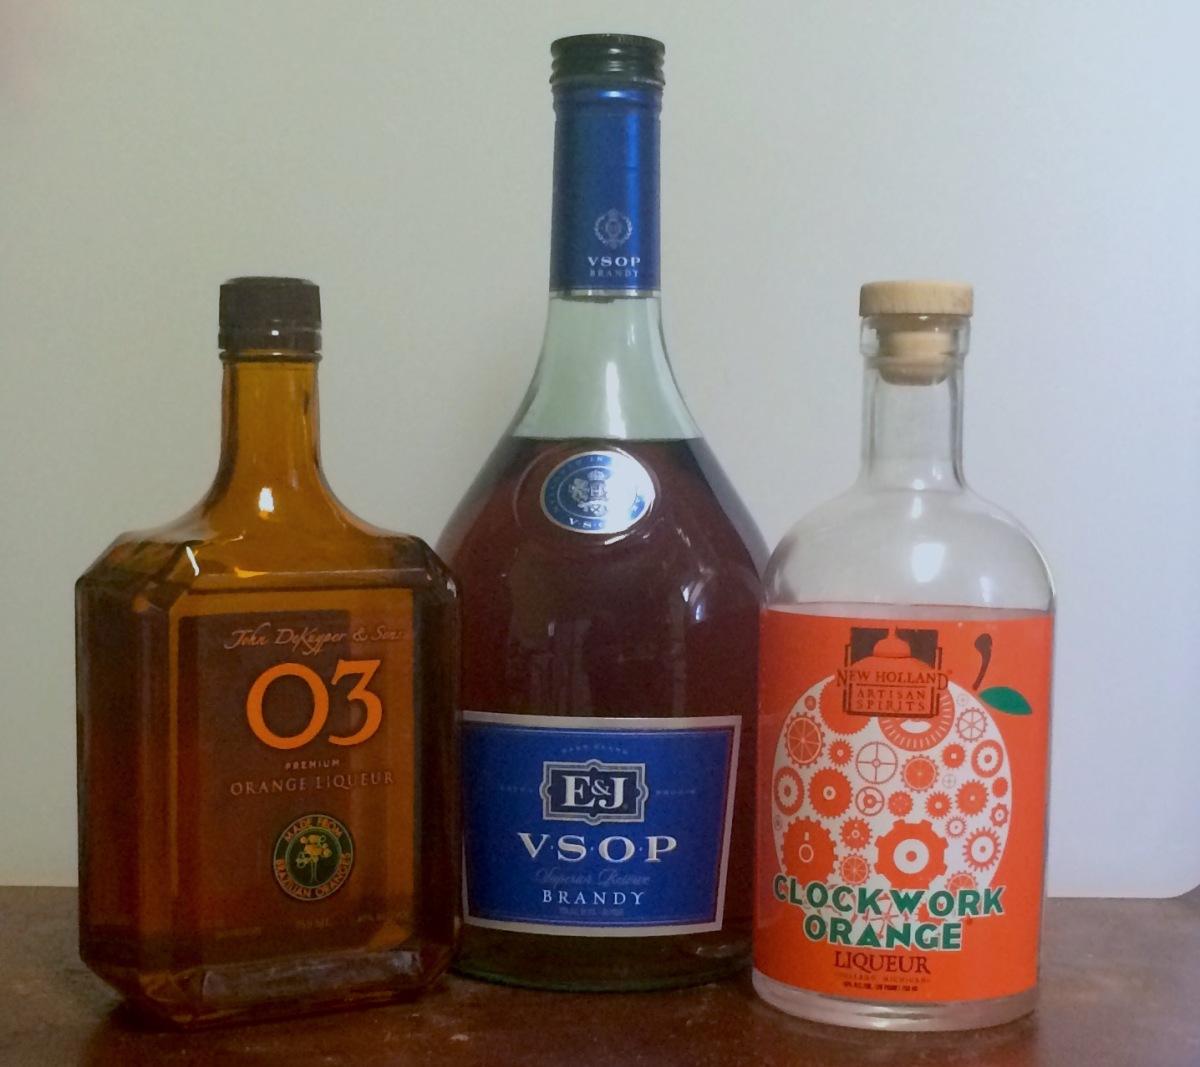 O3 orange liqueur, brandy, and New Holland's Clockwork Orange